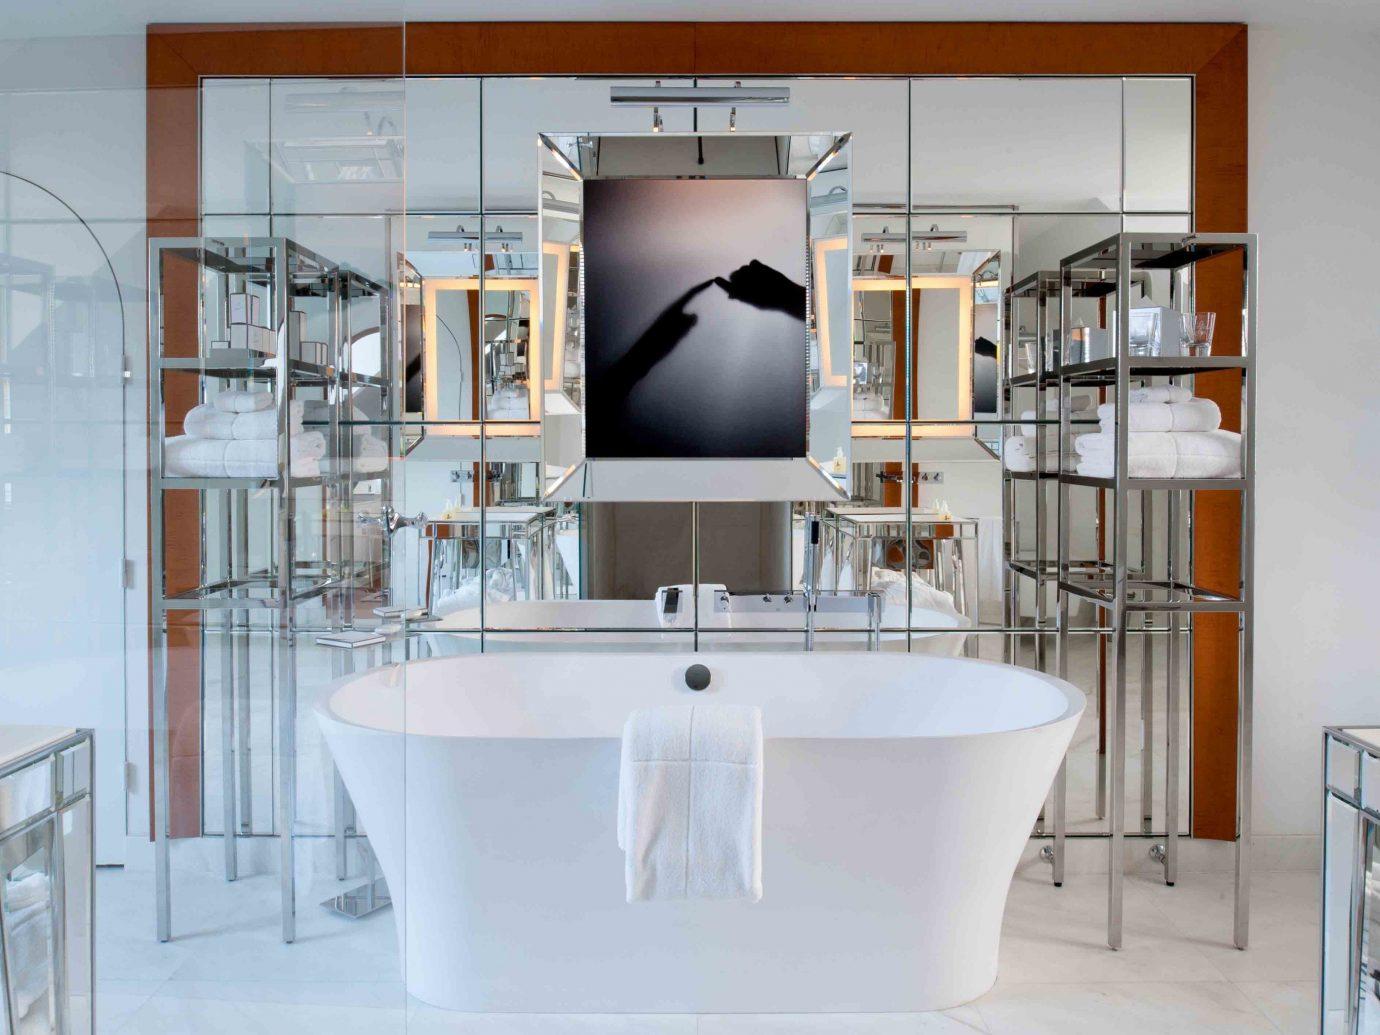 France Hotels Paris indoor wall room bathroom interior design furniture home plumbing fixture Design bathtub cabinetry bathroom cabinet kitchen appliance